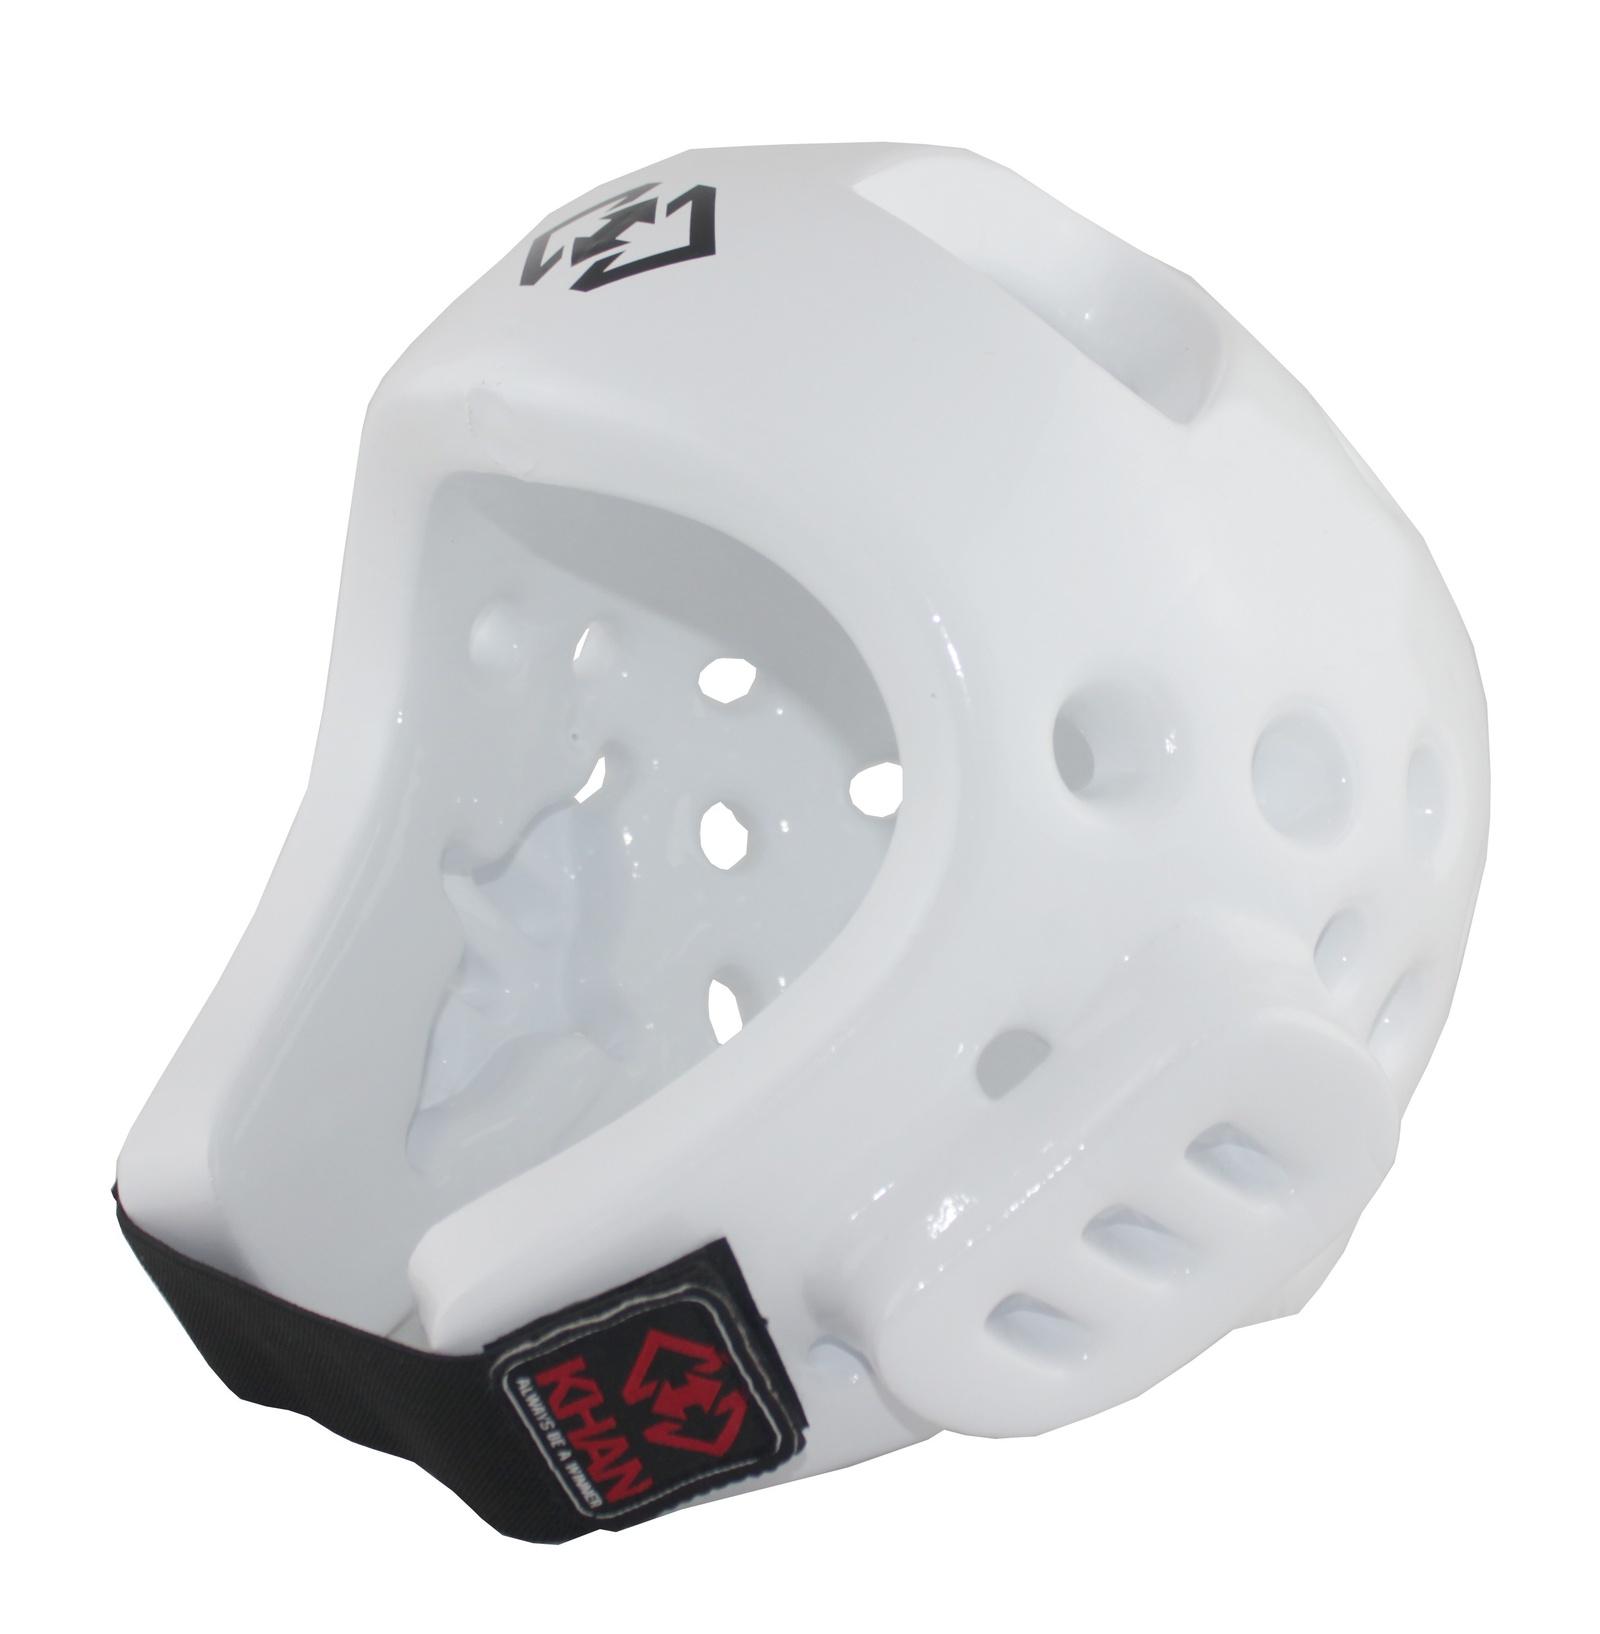 Шлем для тхэквондо Khan Защита головы (шлем) Khan Club белый, цвет: белый. E1106801_2. Размер S, E1106801_2 цена и фото